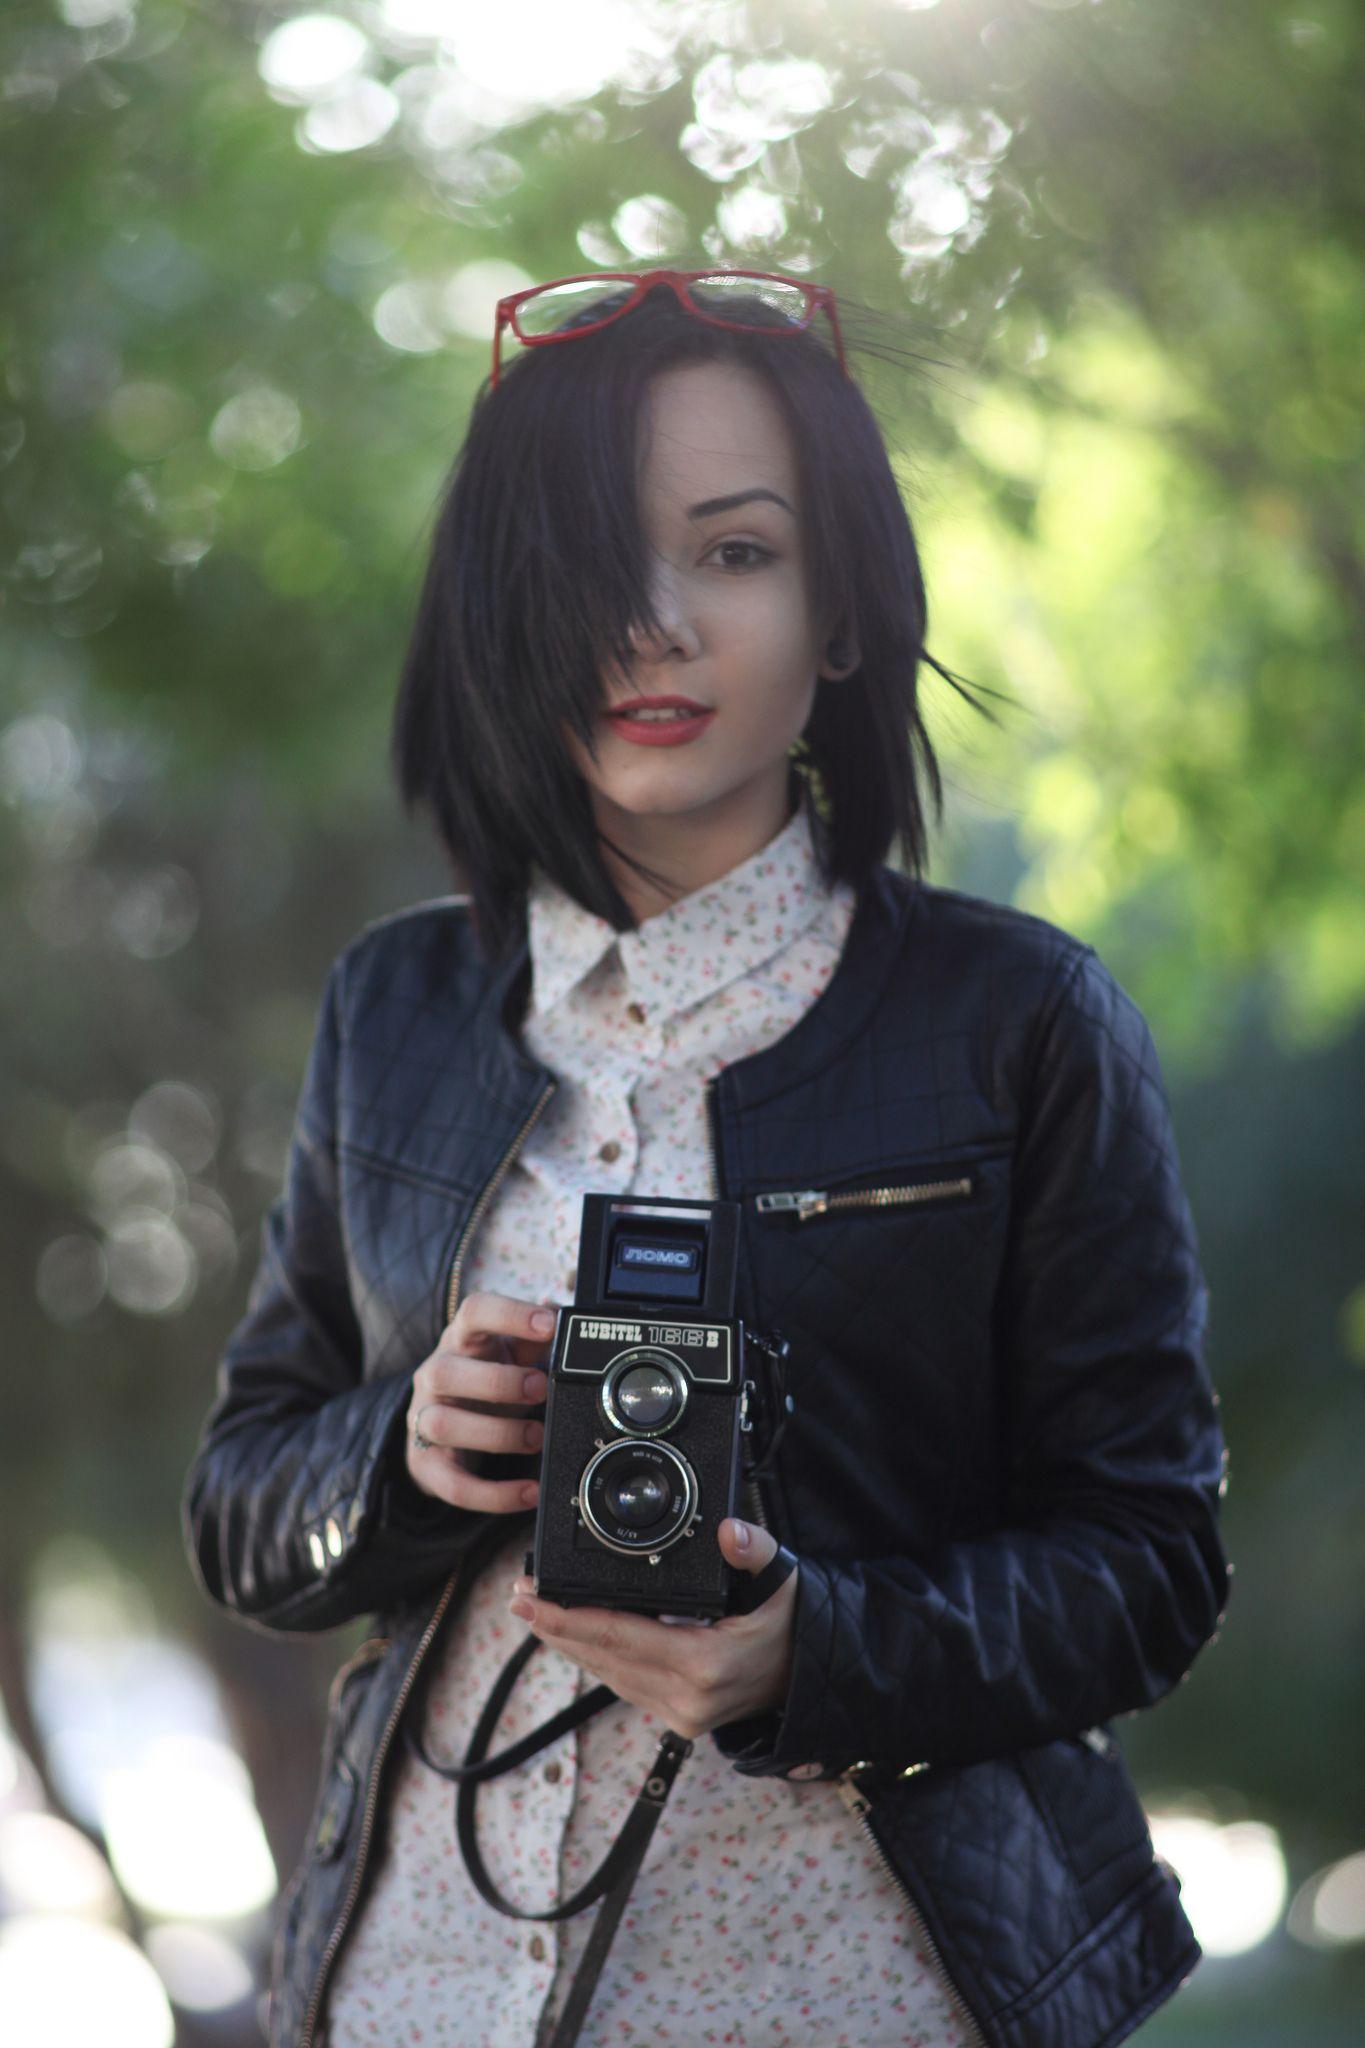 Lubitel 166 Canon Ef 135 Mm F 2 8 Softfocus Insta Fashion Portrait Canon Ef